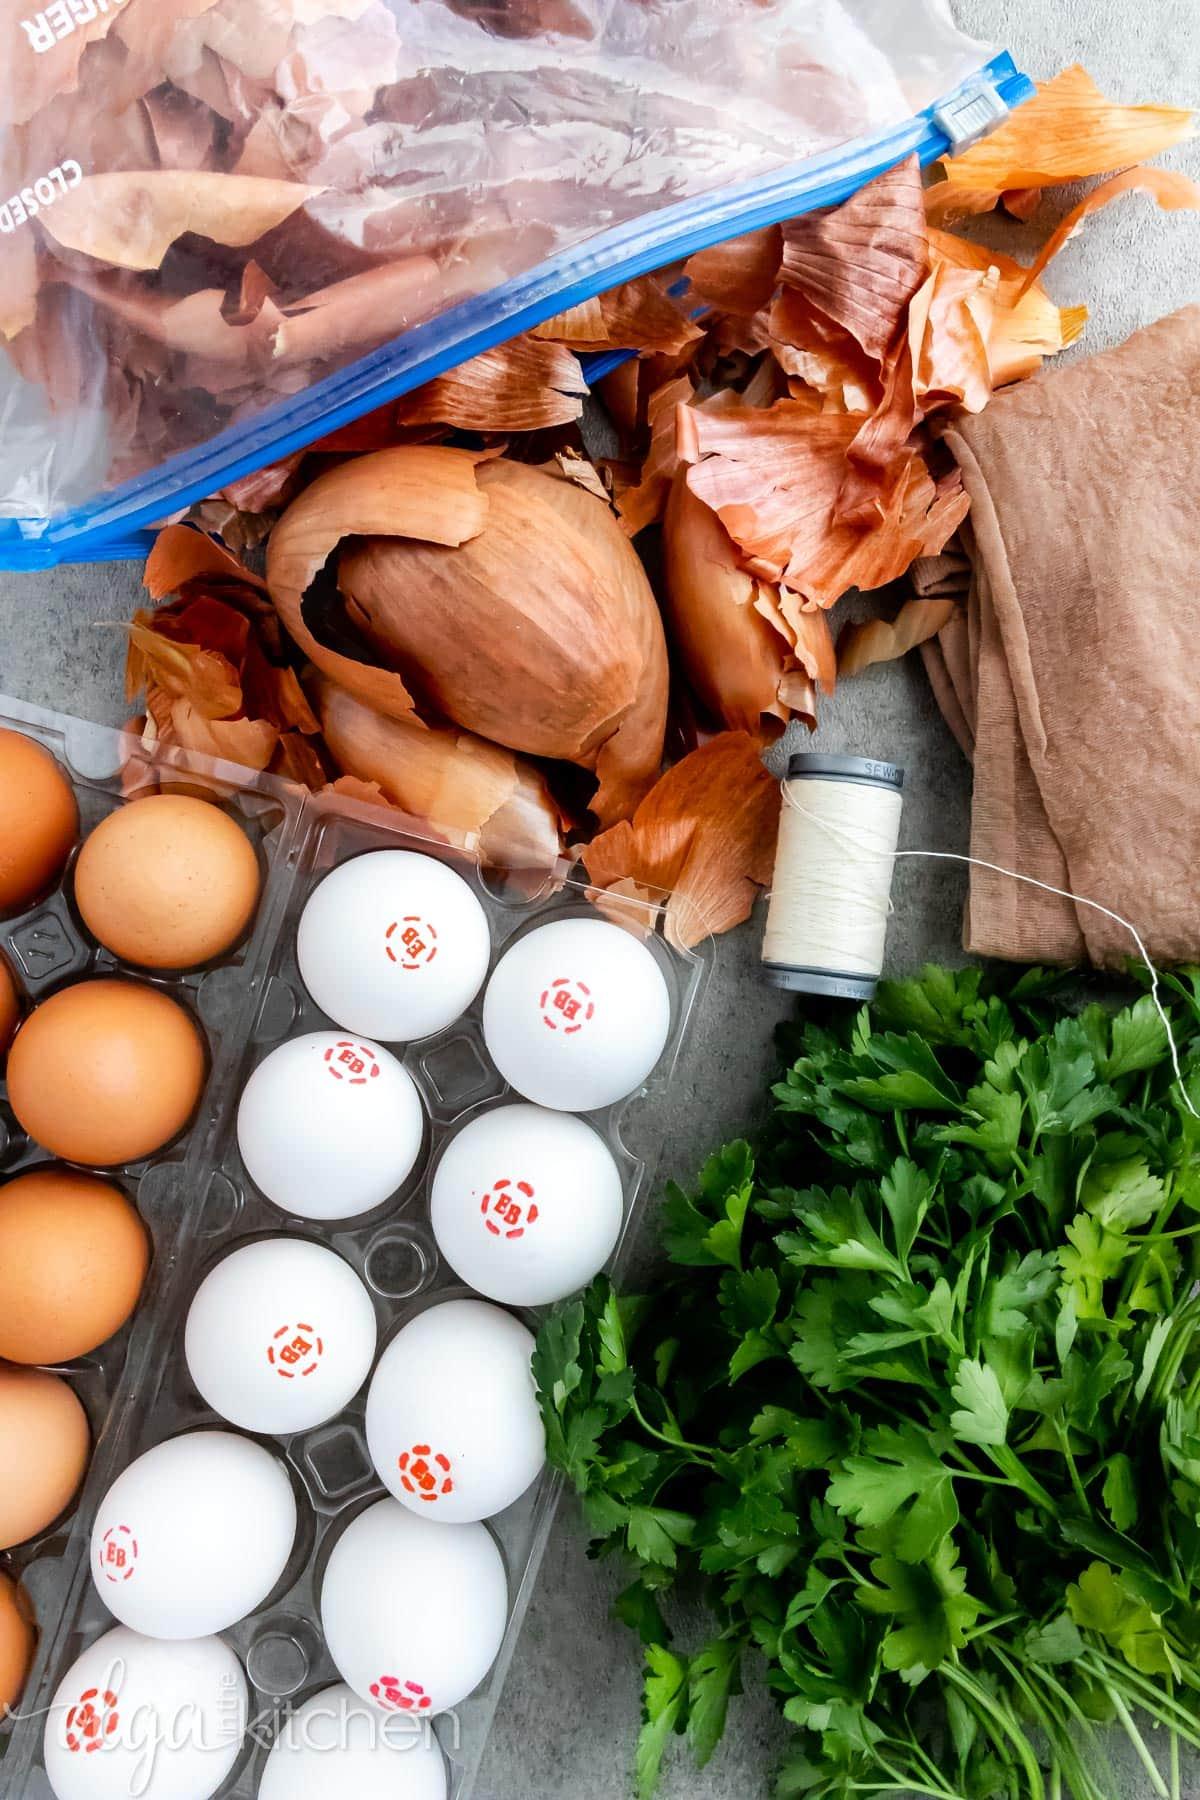 Ingredients for natural egg dye.